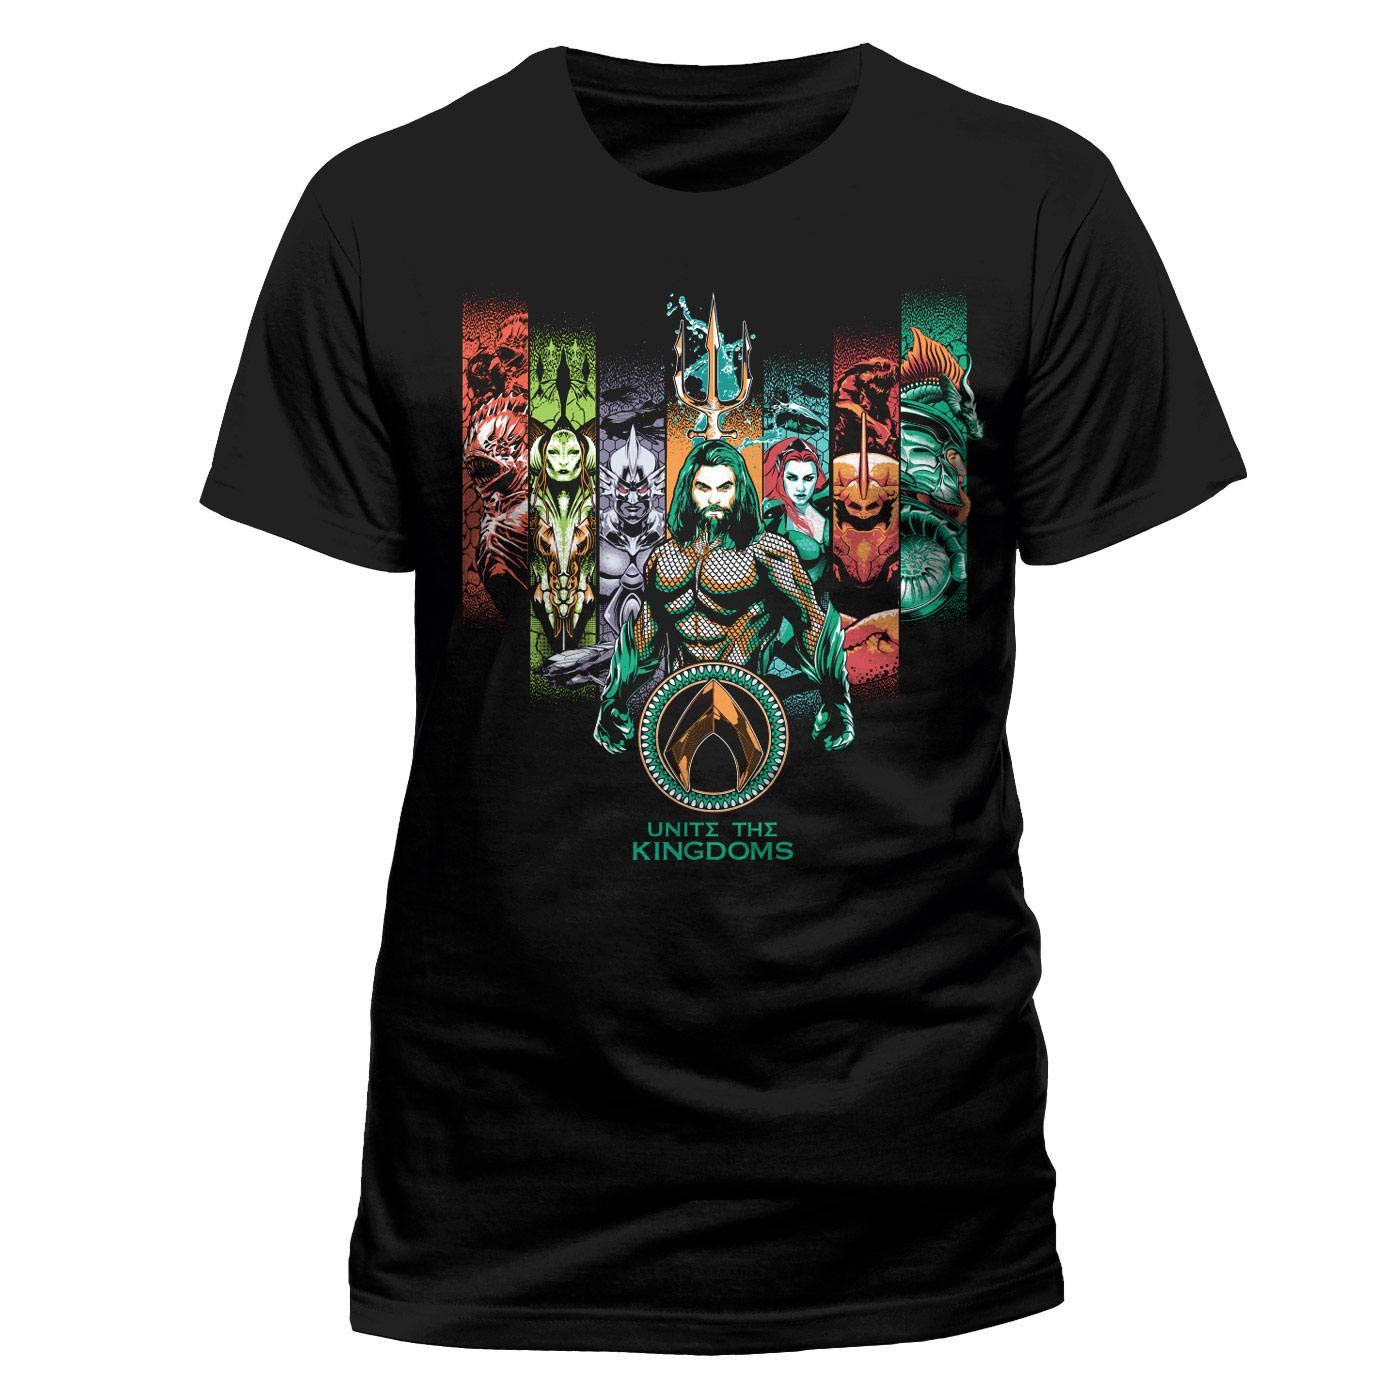 Aquaman Movie T-Shirt Unite The Kingdoms Size M